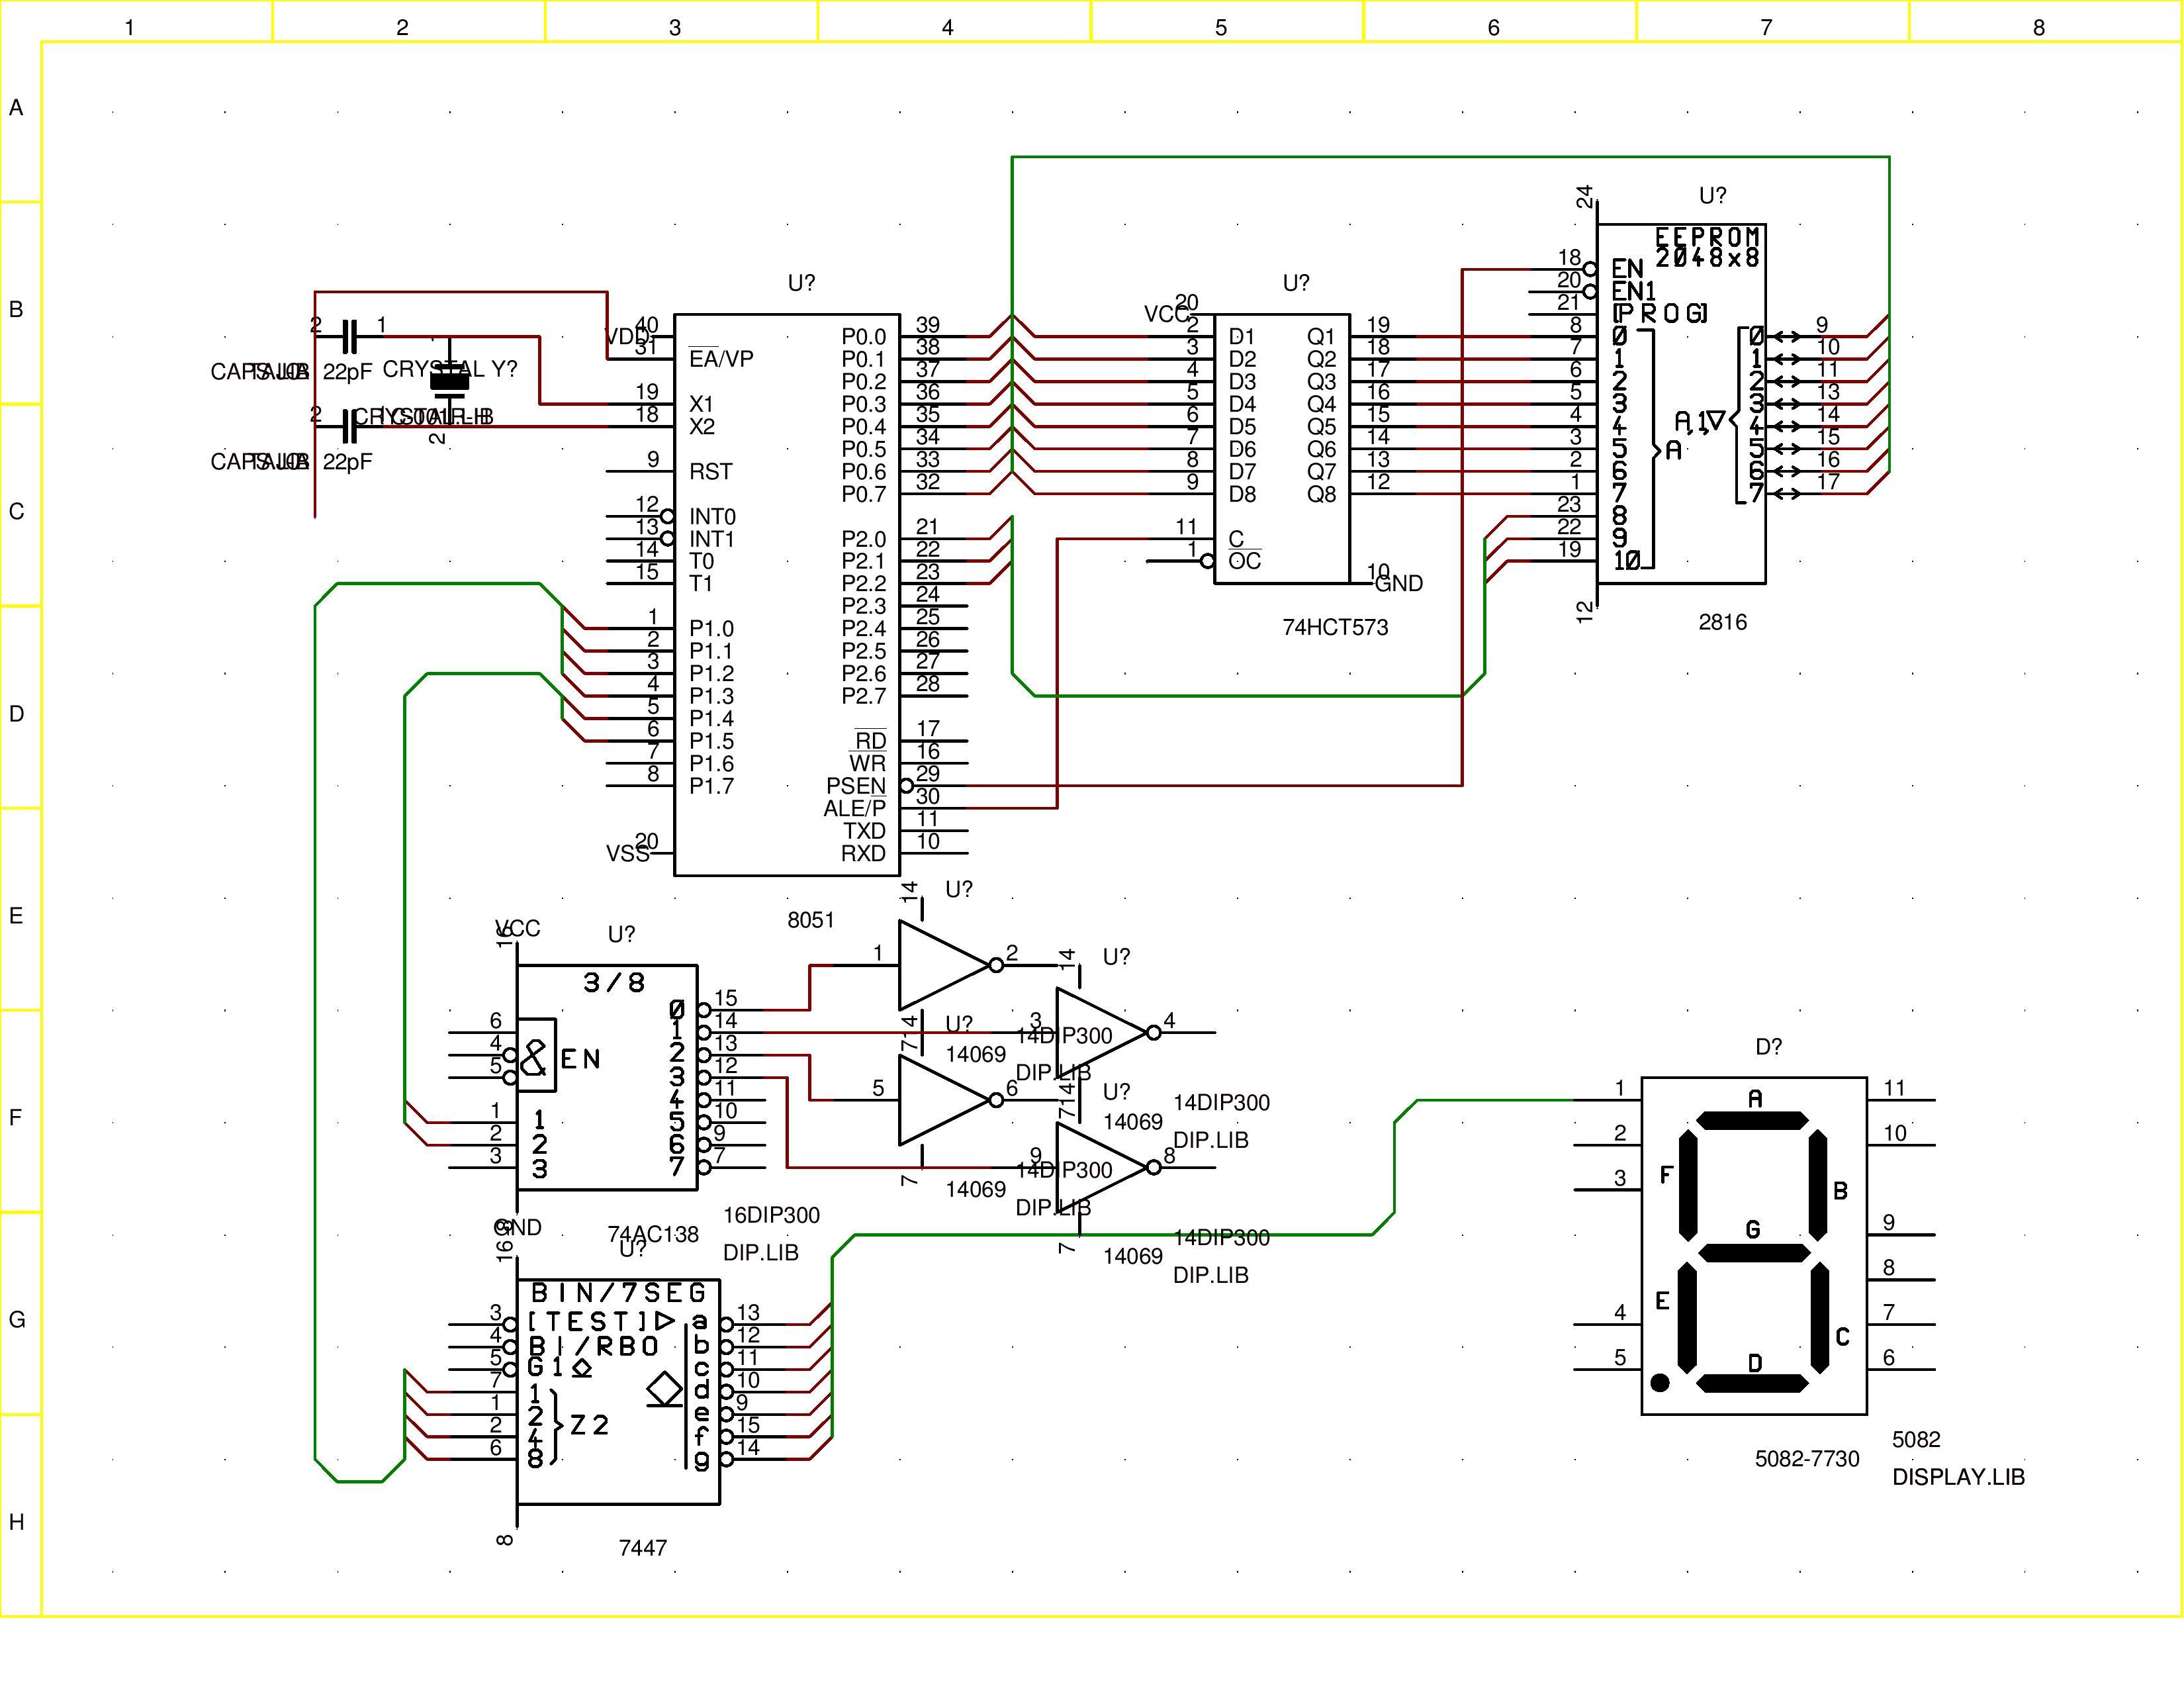 doc] ➤ diagram abs resevoir 2006 audi a6 engine diagram ebook